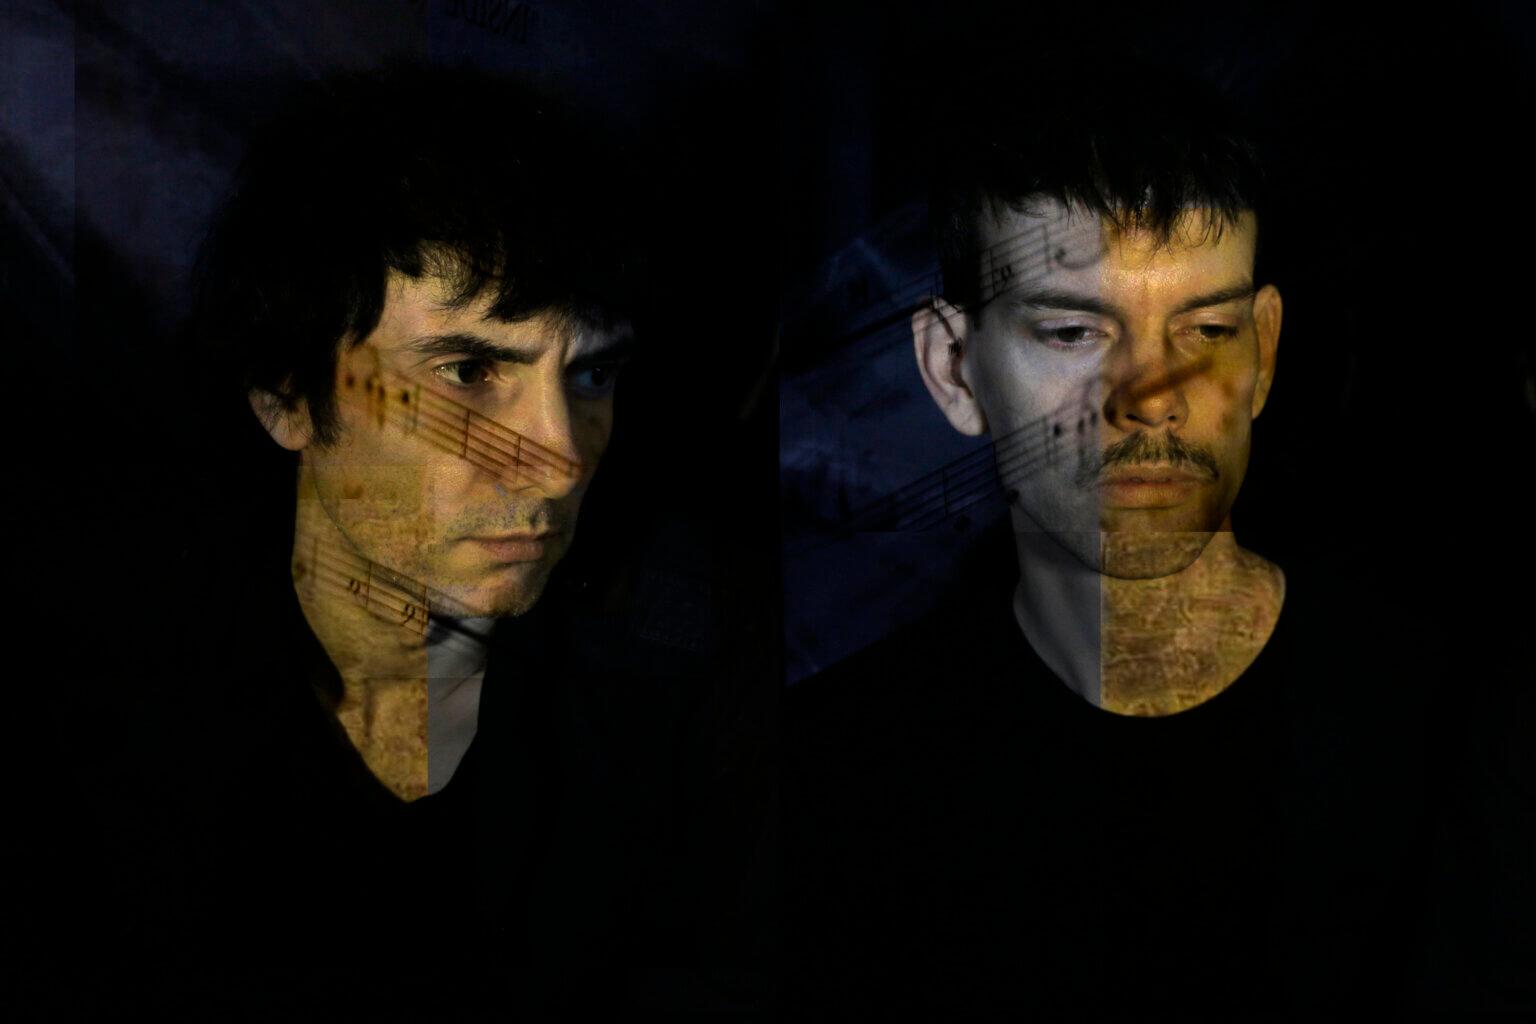 Digital 21 & Stefan Olsdal Debut 'Multiverse' ft: Inanna